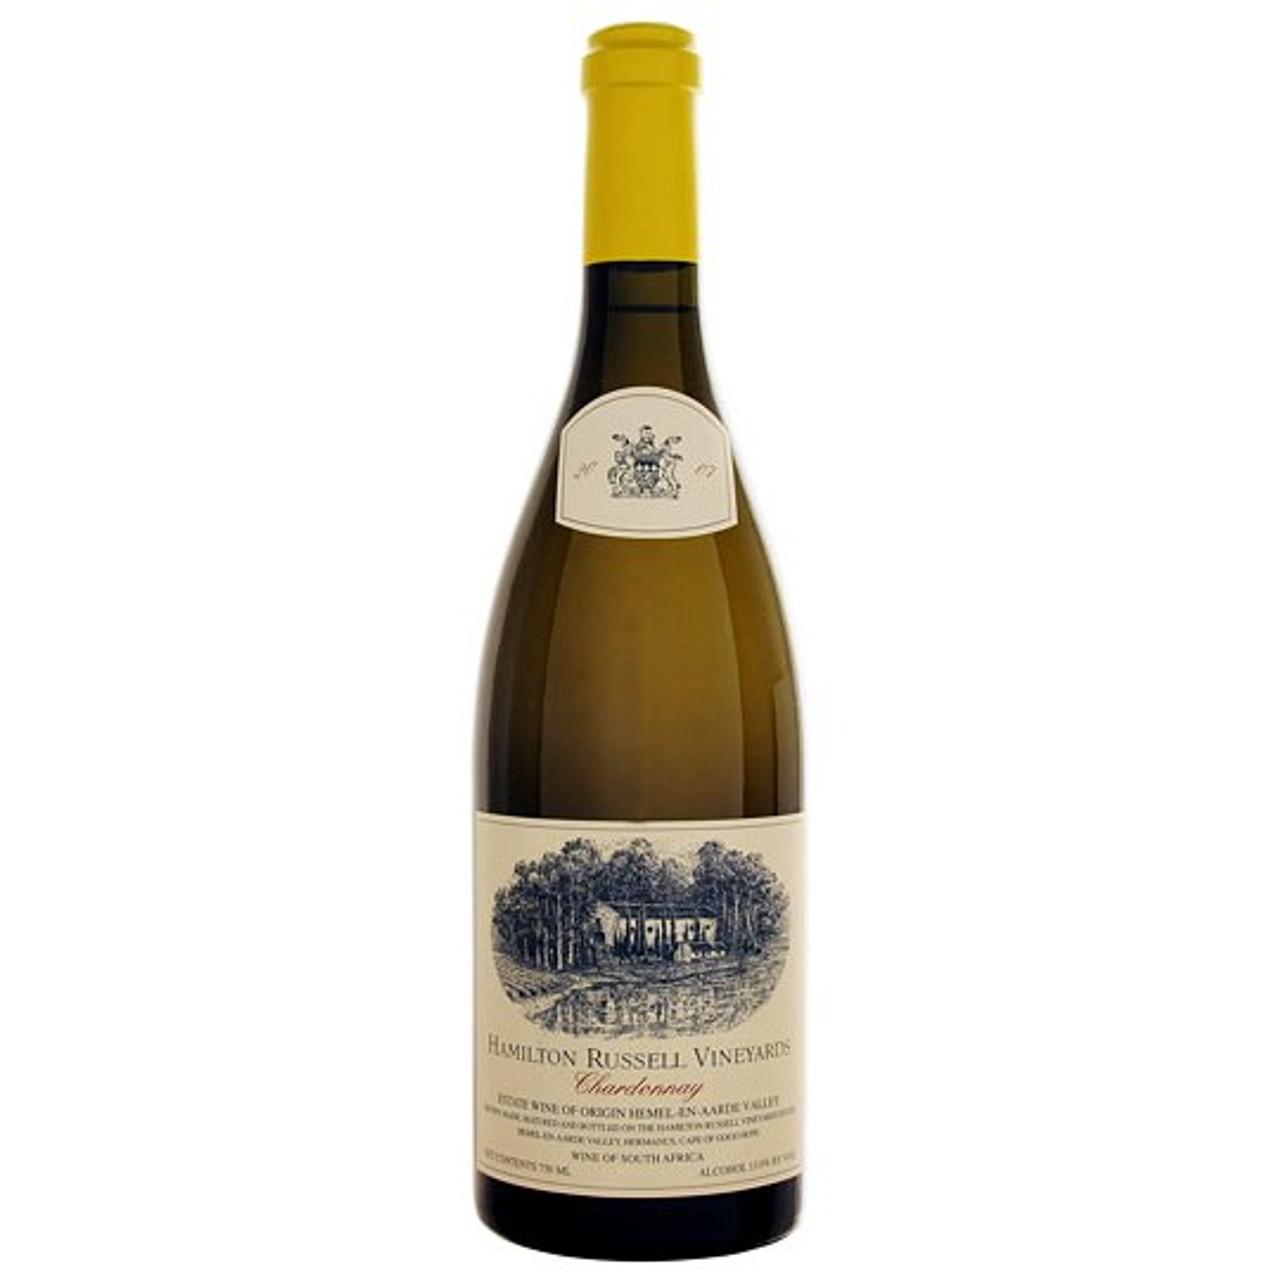 Hamilton Russell Vineyards, Hemel-en-Aarde Valley Chardonnay 2017